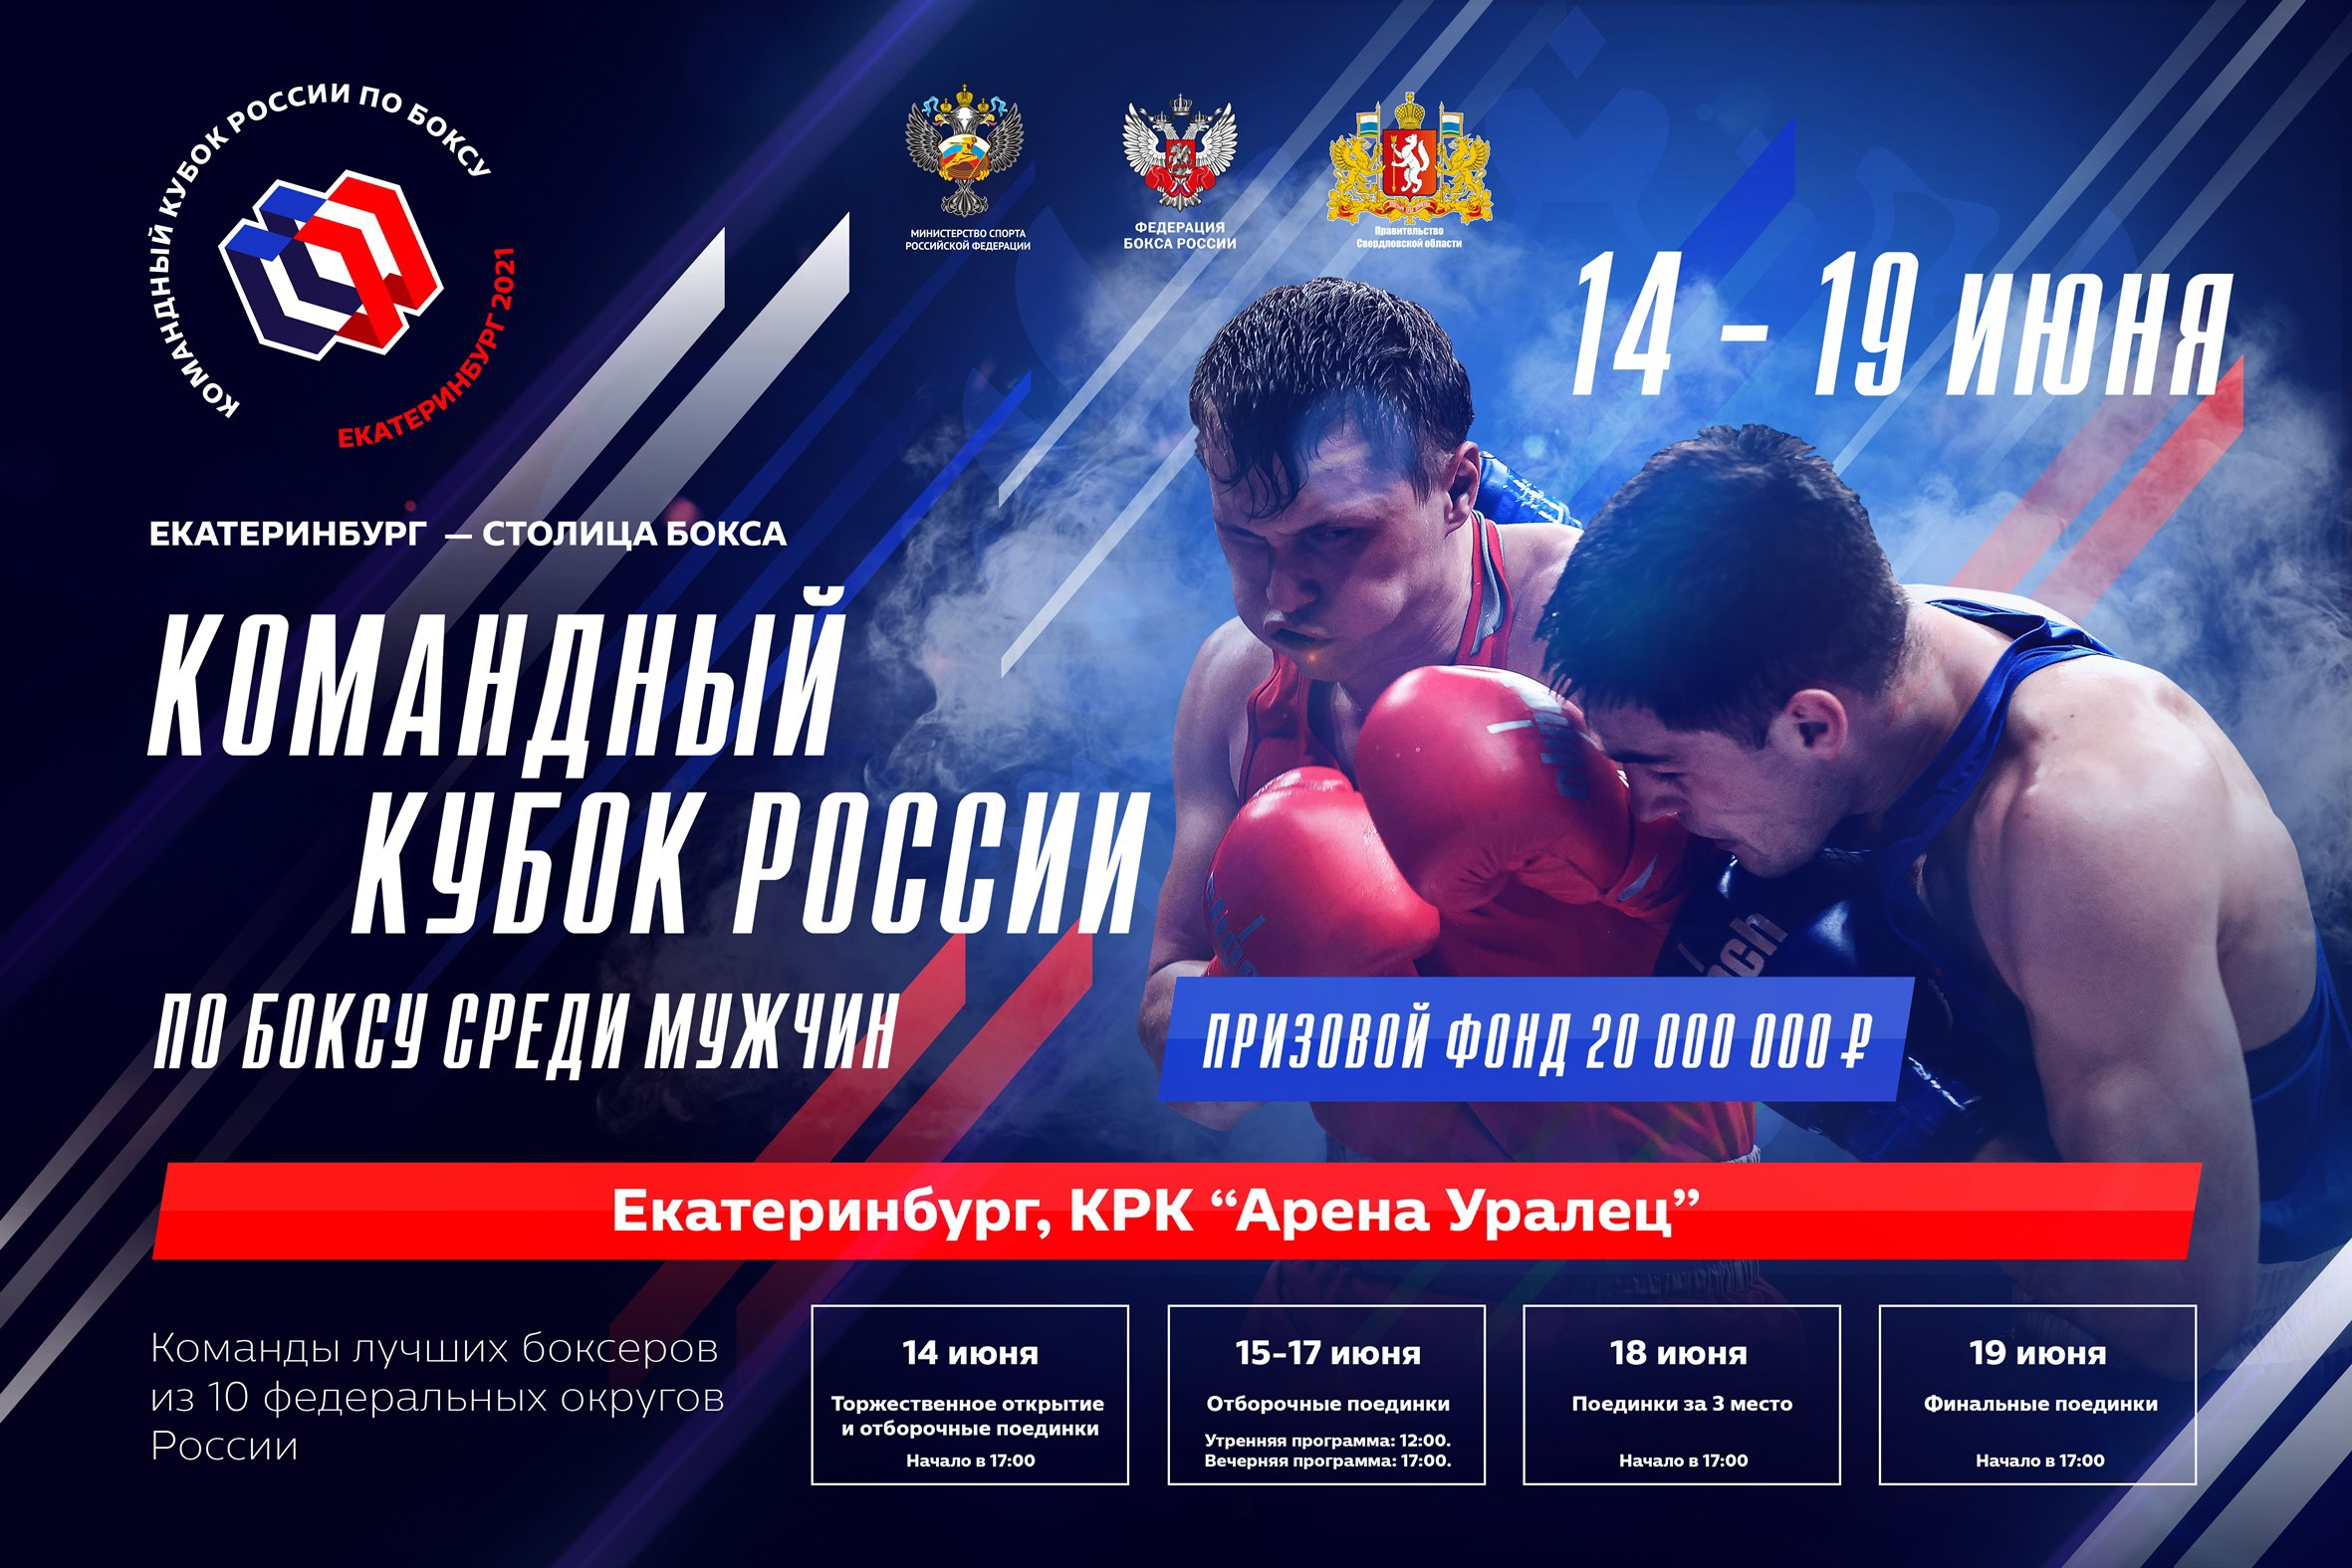 Командный кубок России по боксу среди мужчин (2021, Екатеринбург)